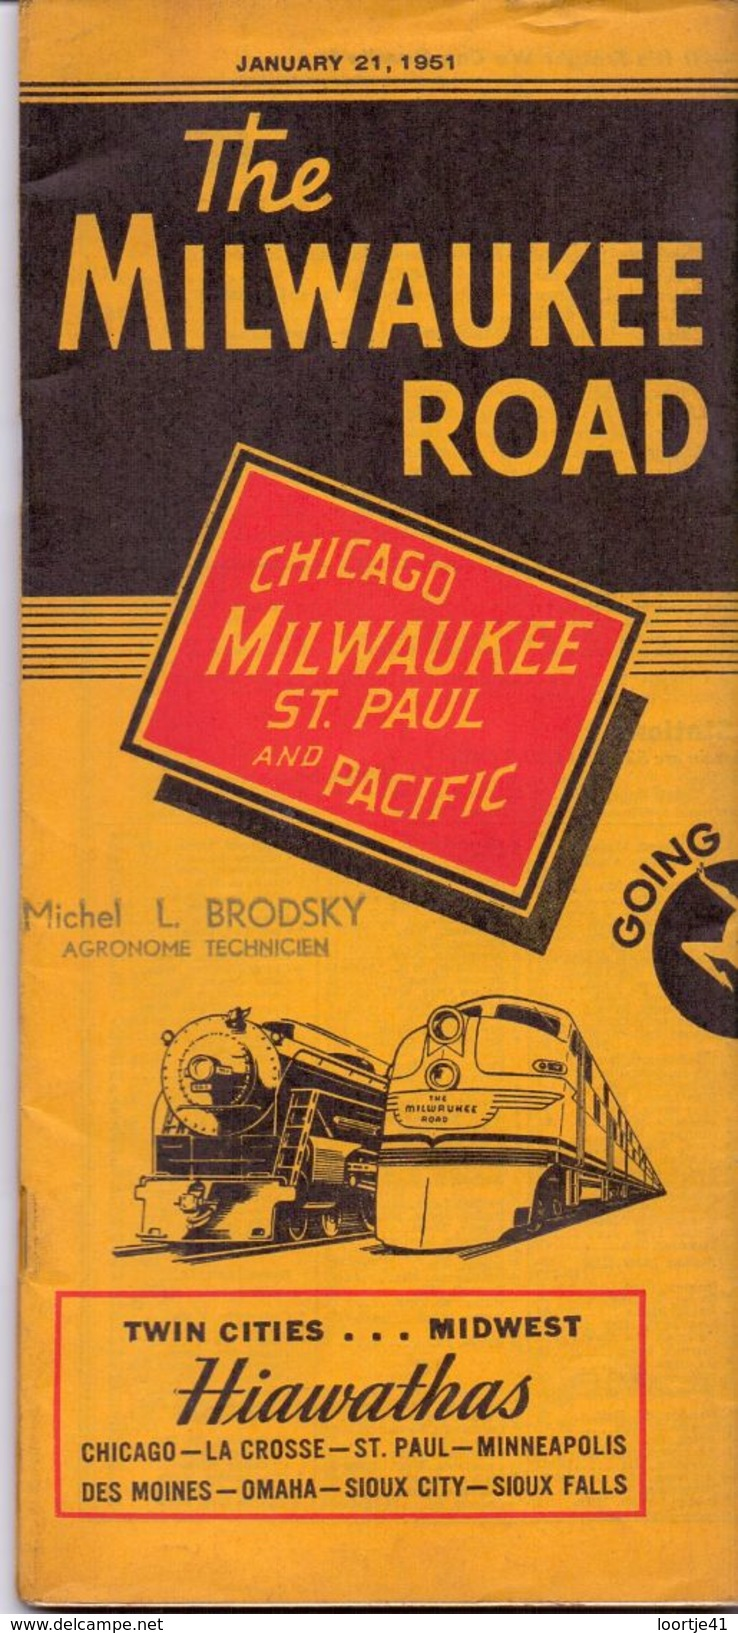 Dienstregeling Horaire Chemins De Fer - Schedules Railways The Milwaukee Road - Chicago - St Paul - Minneapolis 1951 - World